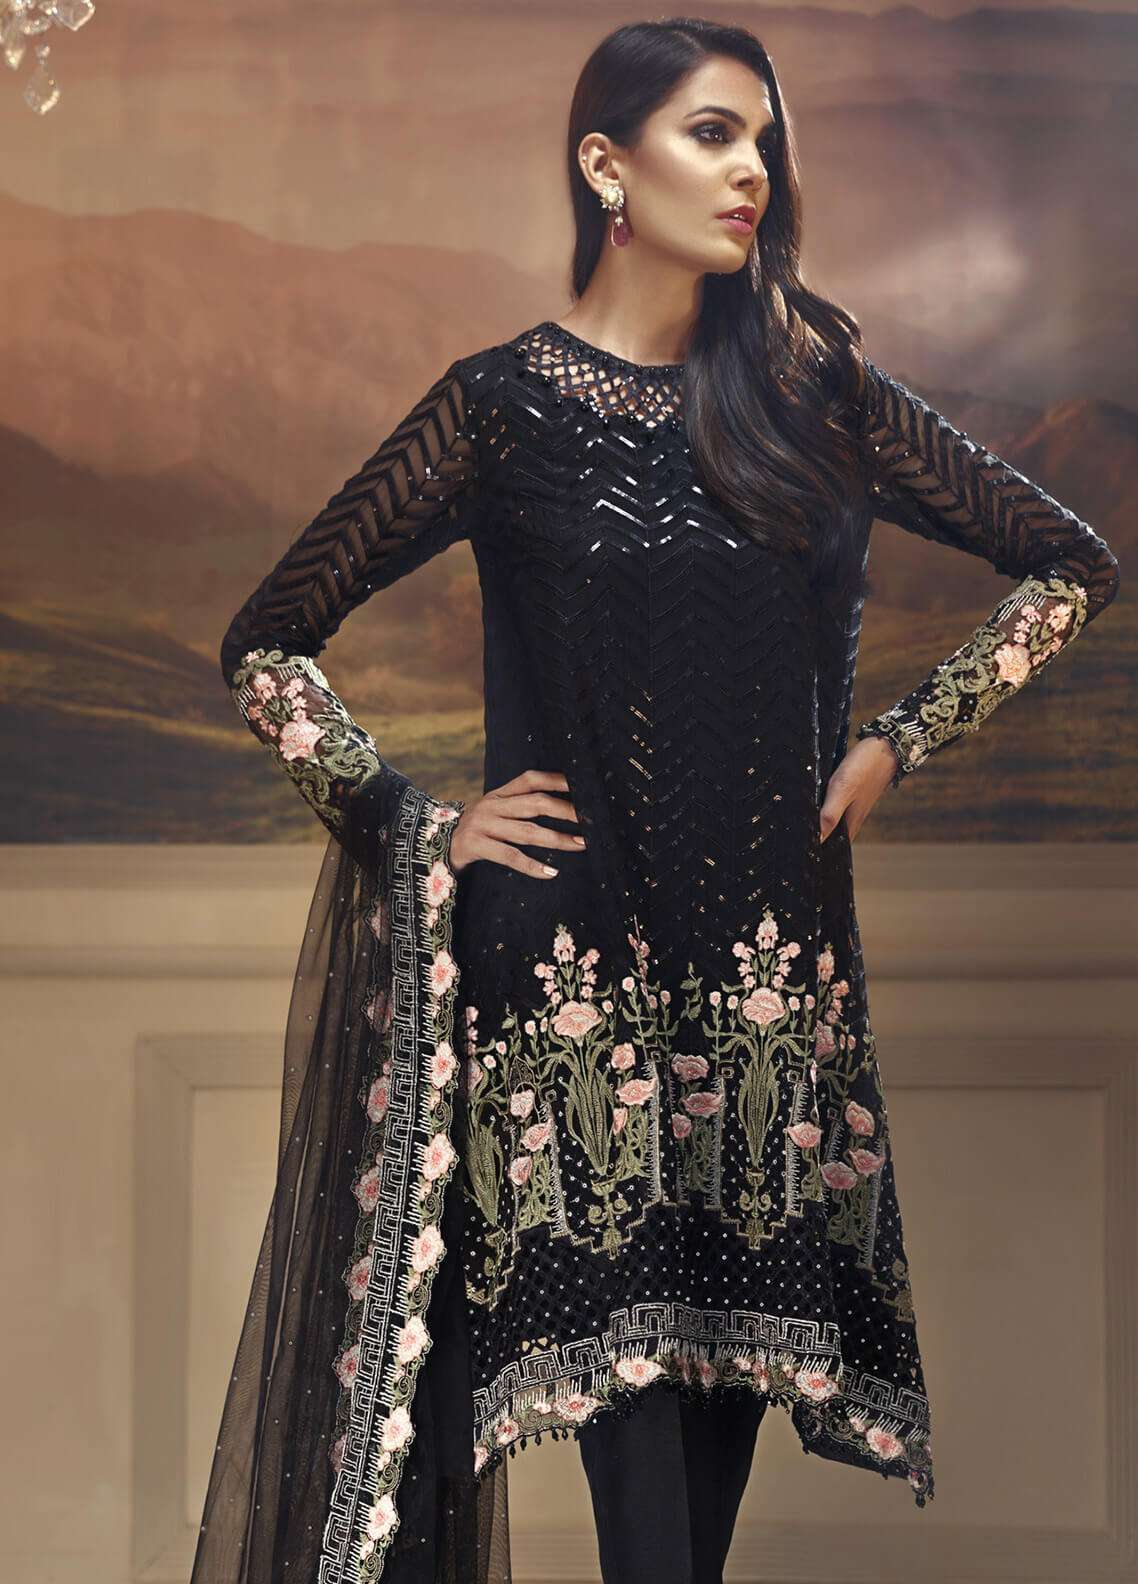 Anaya by Kiran Chaudhry Embroidered Chiffon Unstitched 3 Piece Suit AKC18W 08 - Wedding Edition